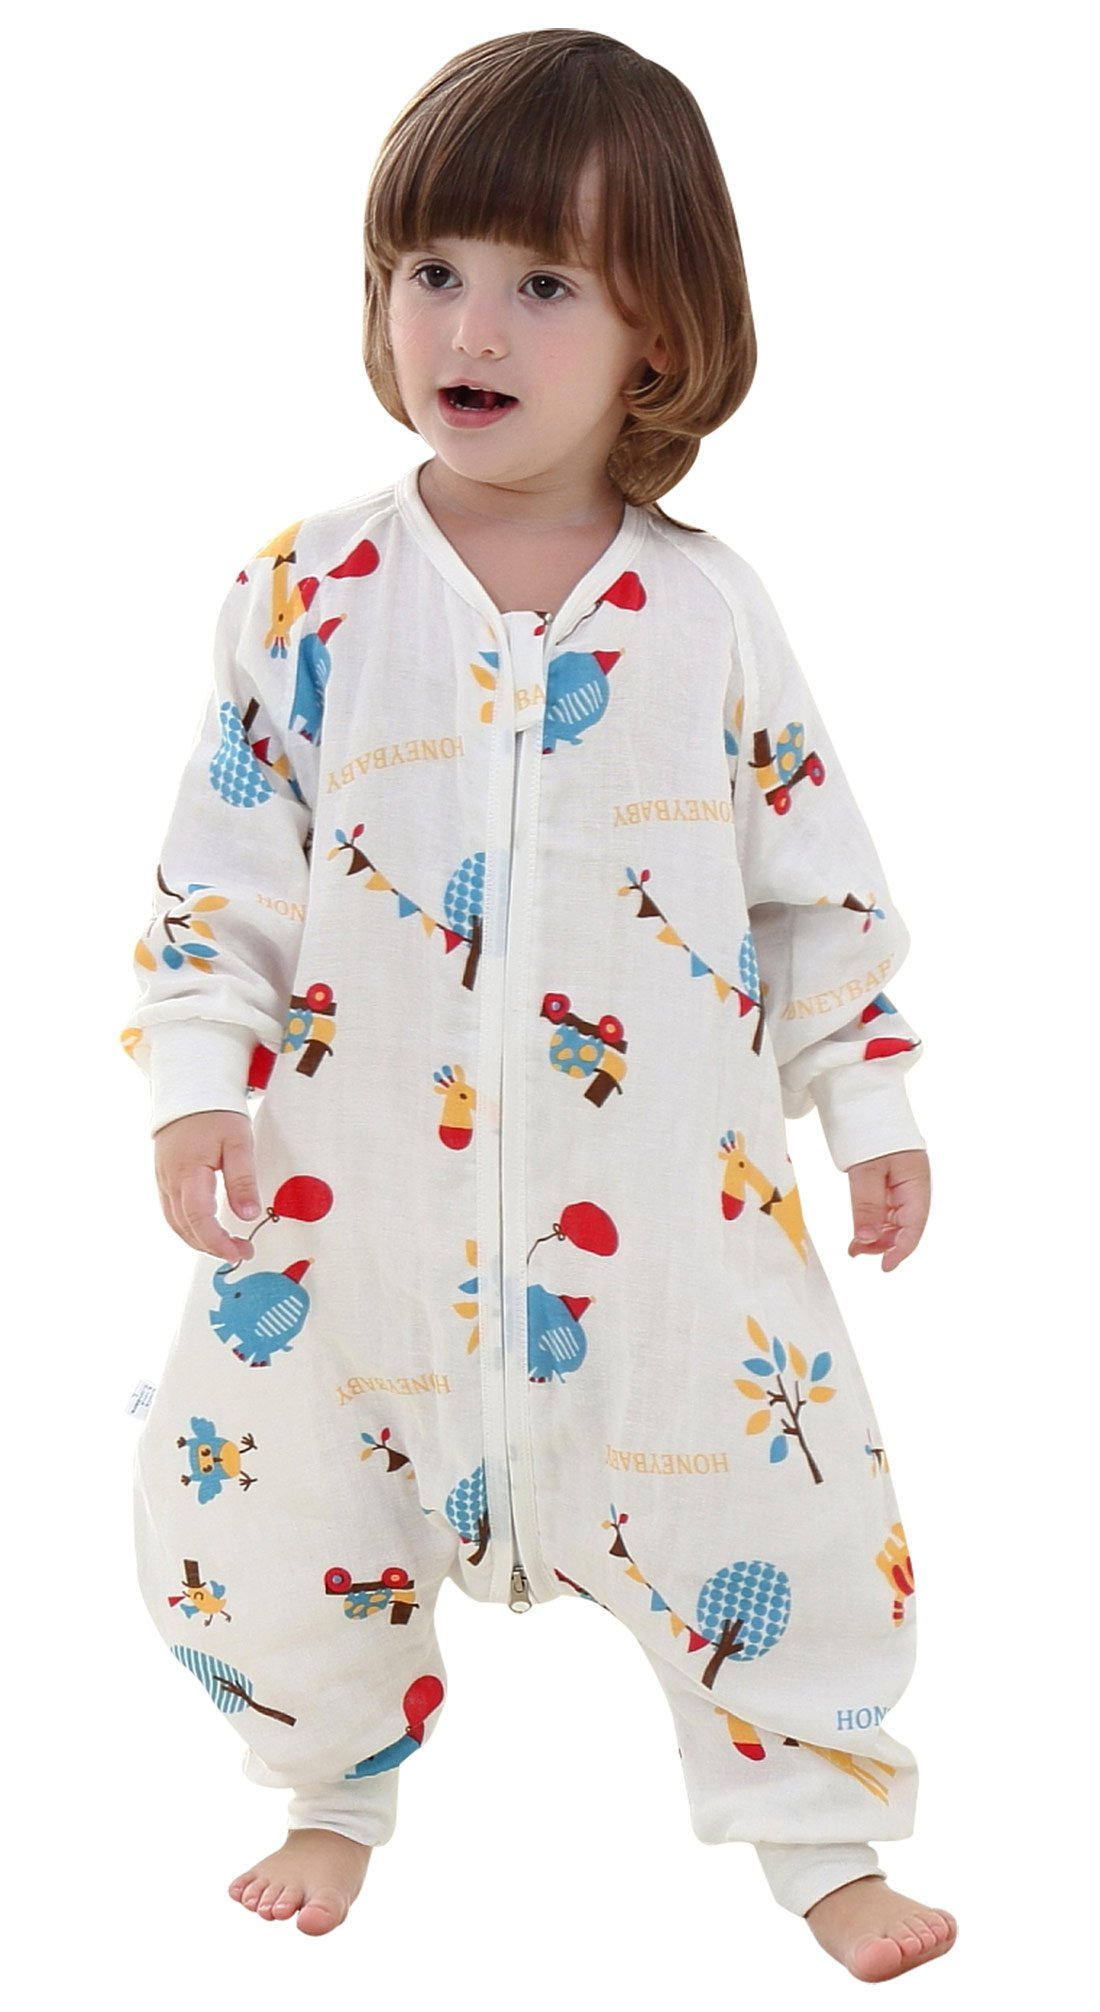 Happy cherry Saco de Dormir para Bebé de Verano Infantil Bolsa de Dormir sin Mangas Ligero con Dos Aberturas Slepping Bag Baby Transpirable con Patas